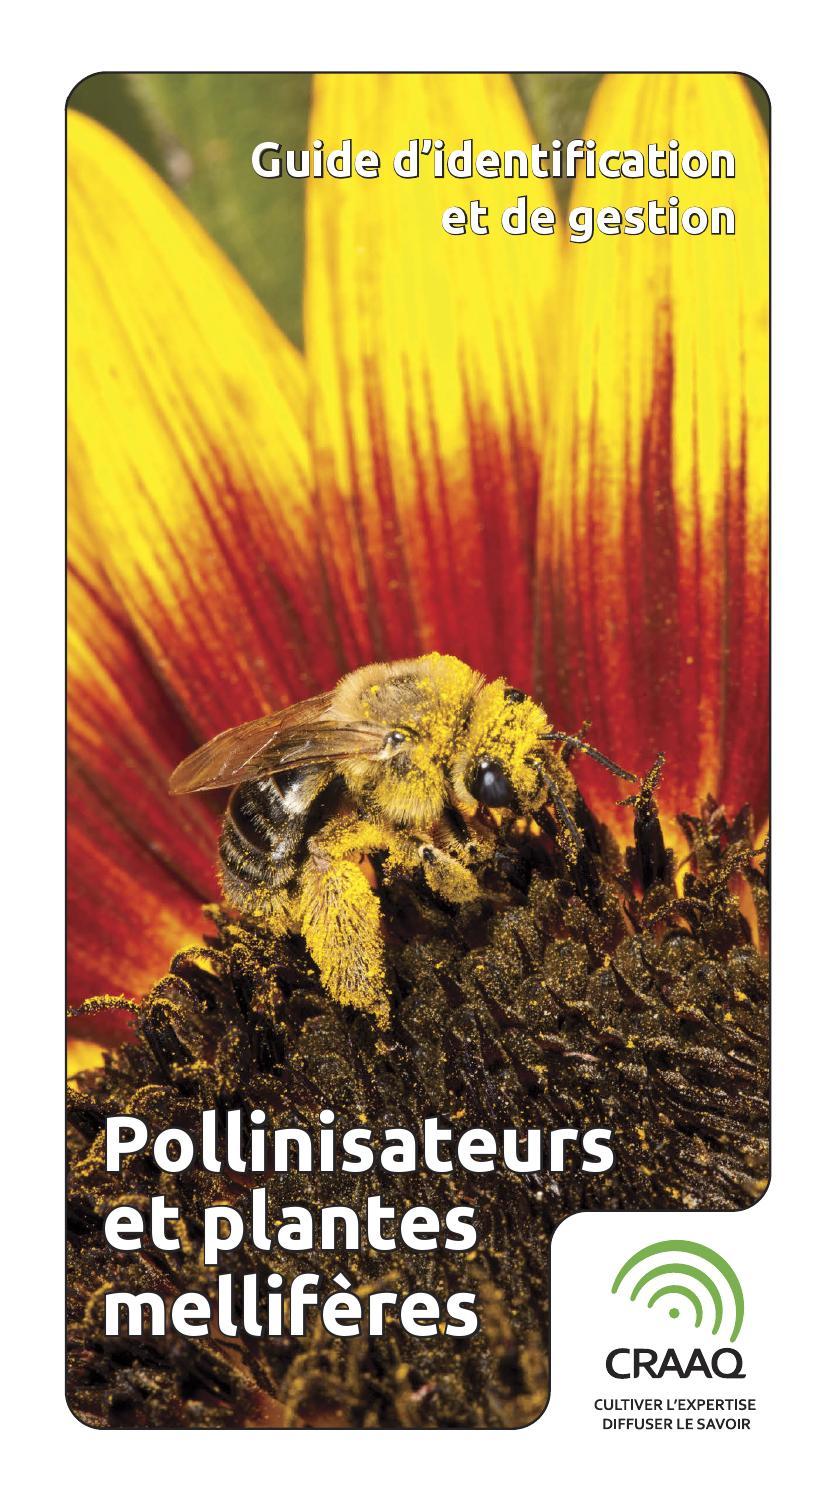 guide d 39 identification et de gestion pollinisateurs et plantes mellif res by craaq issuu. Black Bedroom Furniture Sets. Home Design Ideas